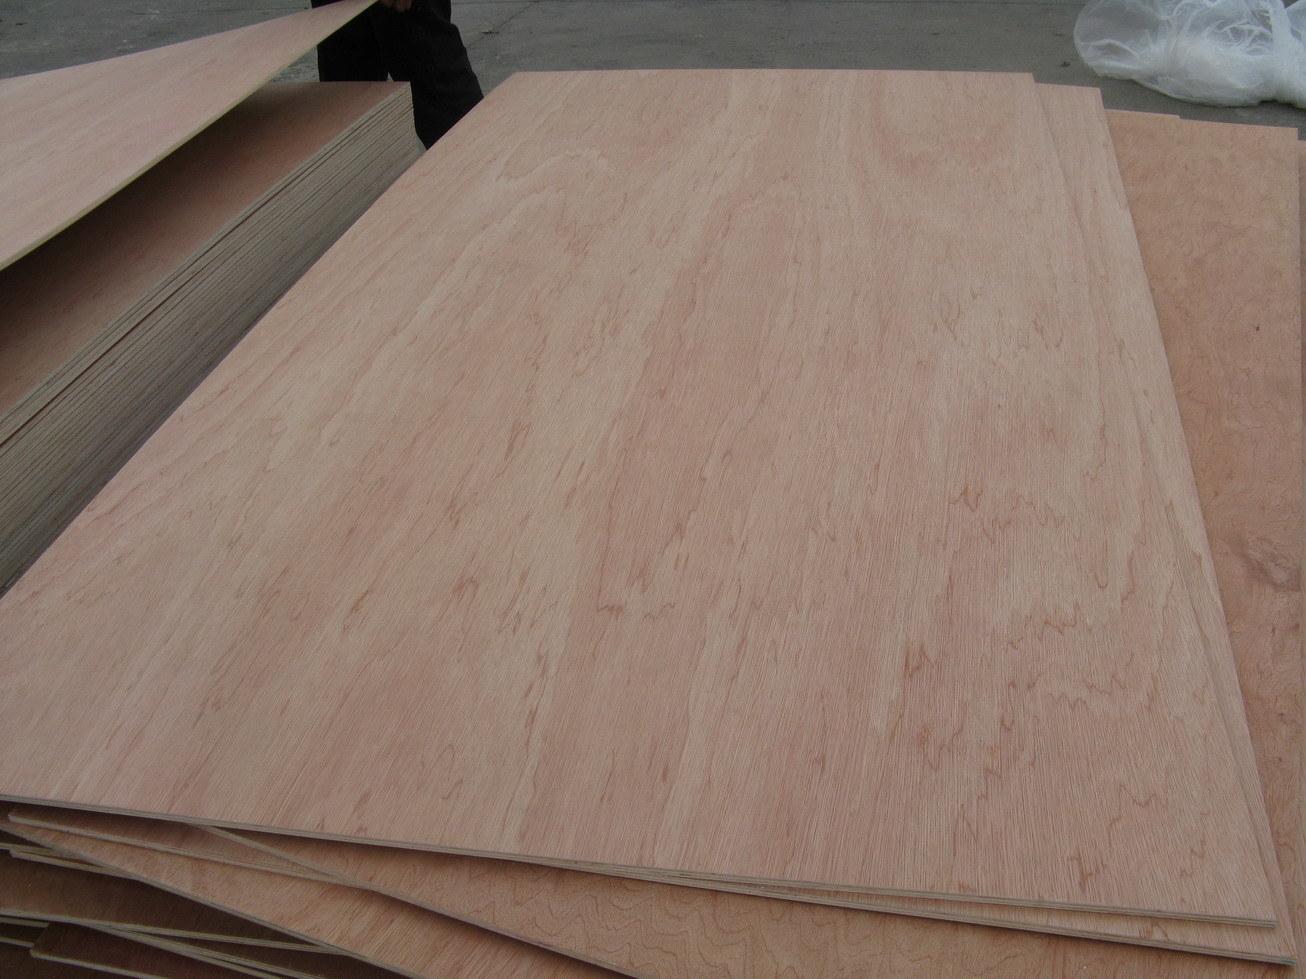 [Hot Item] Factory-Poplar Plywood/Bintangor Plywood/Okoume Plywood/Pine  Plywood and Birch Plywood in 3mm 12mm 15mm 18mm